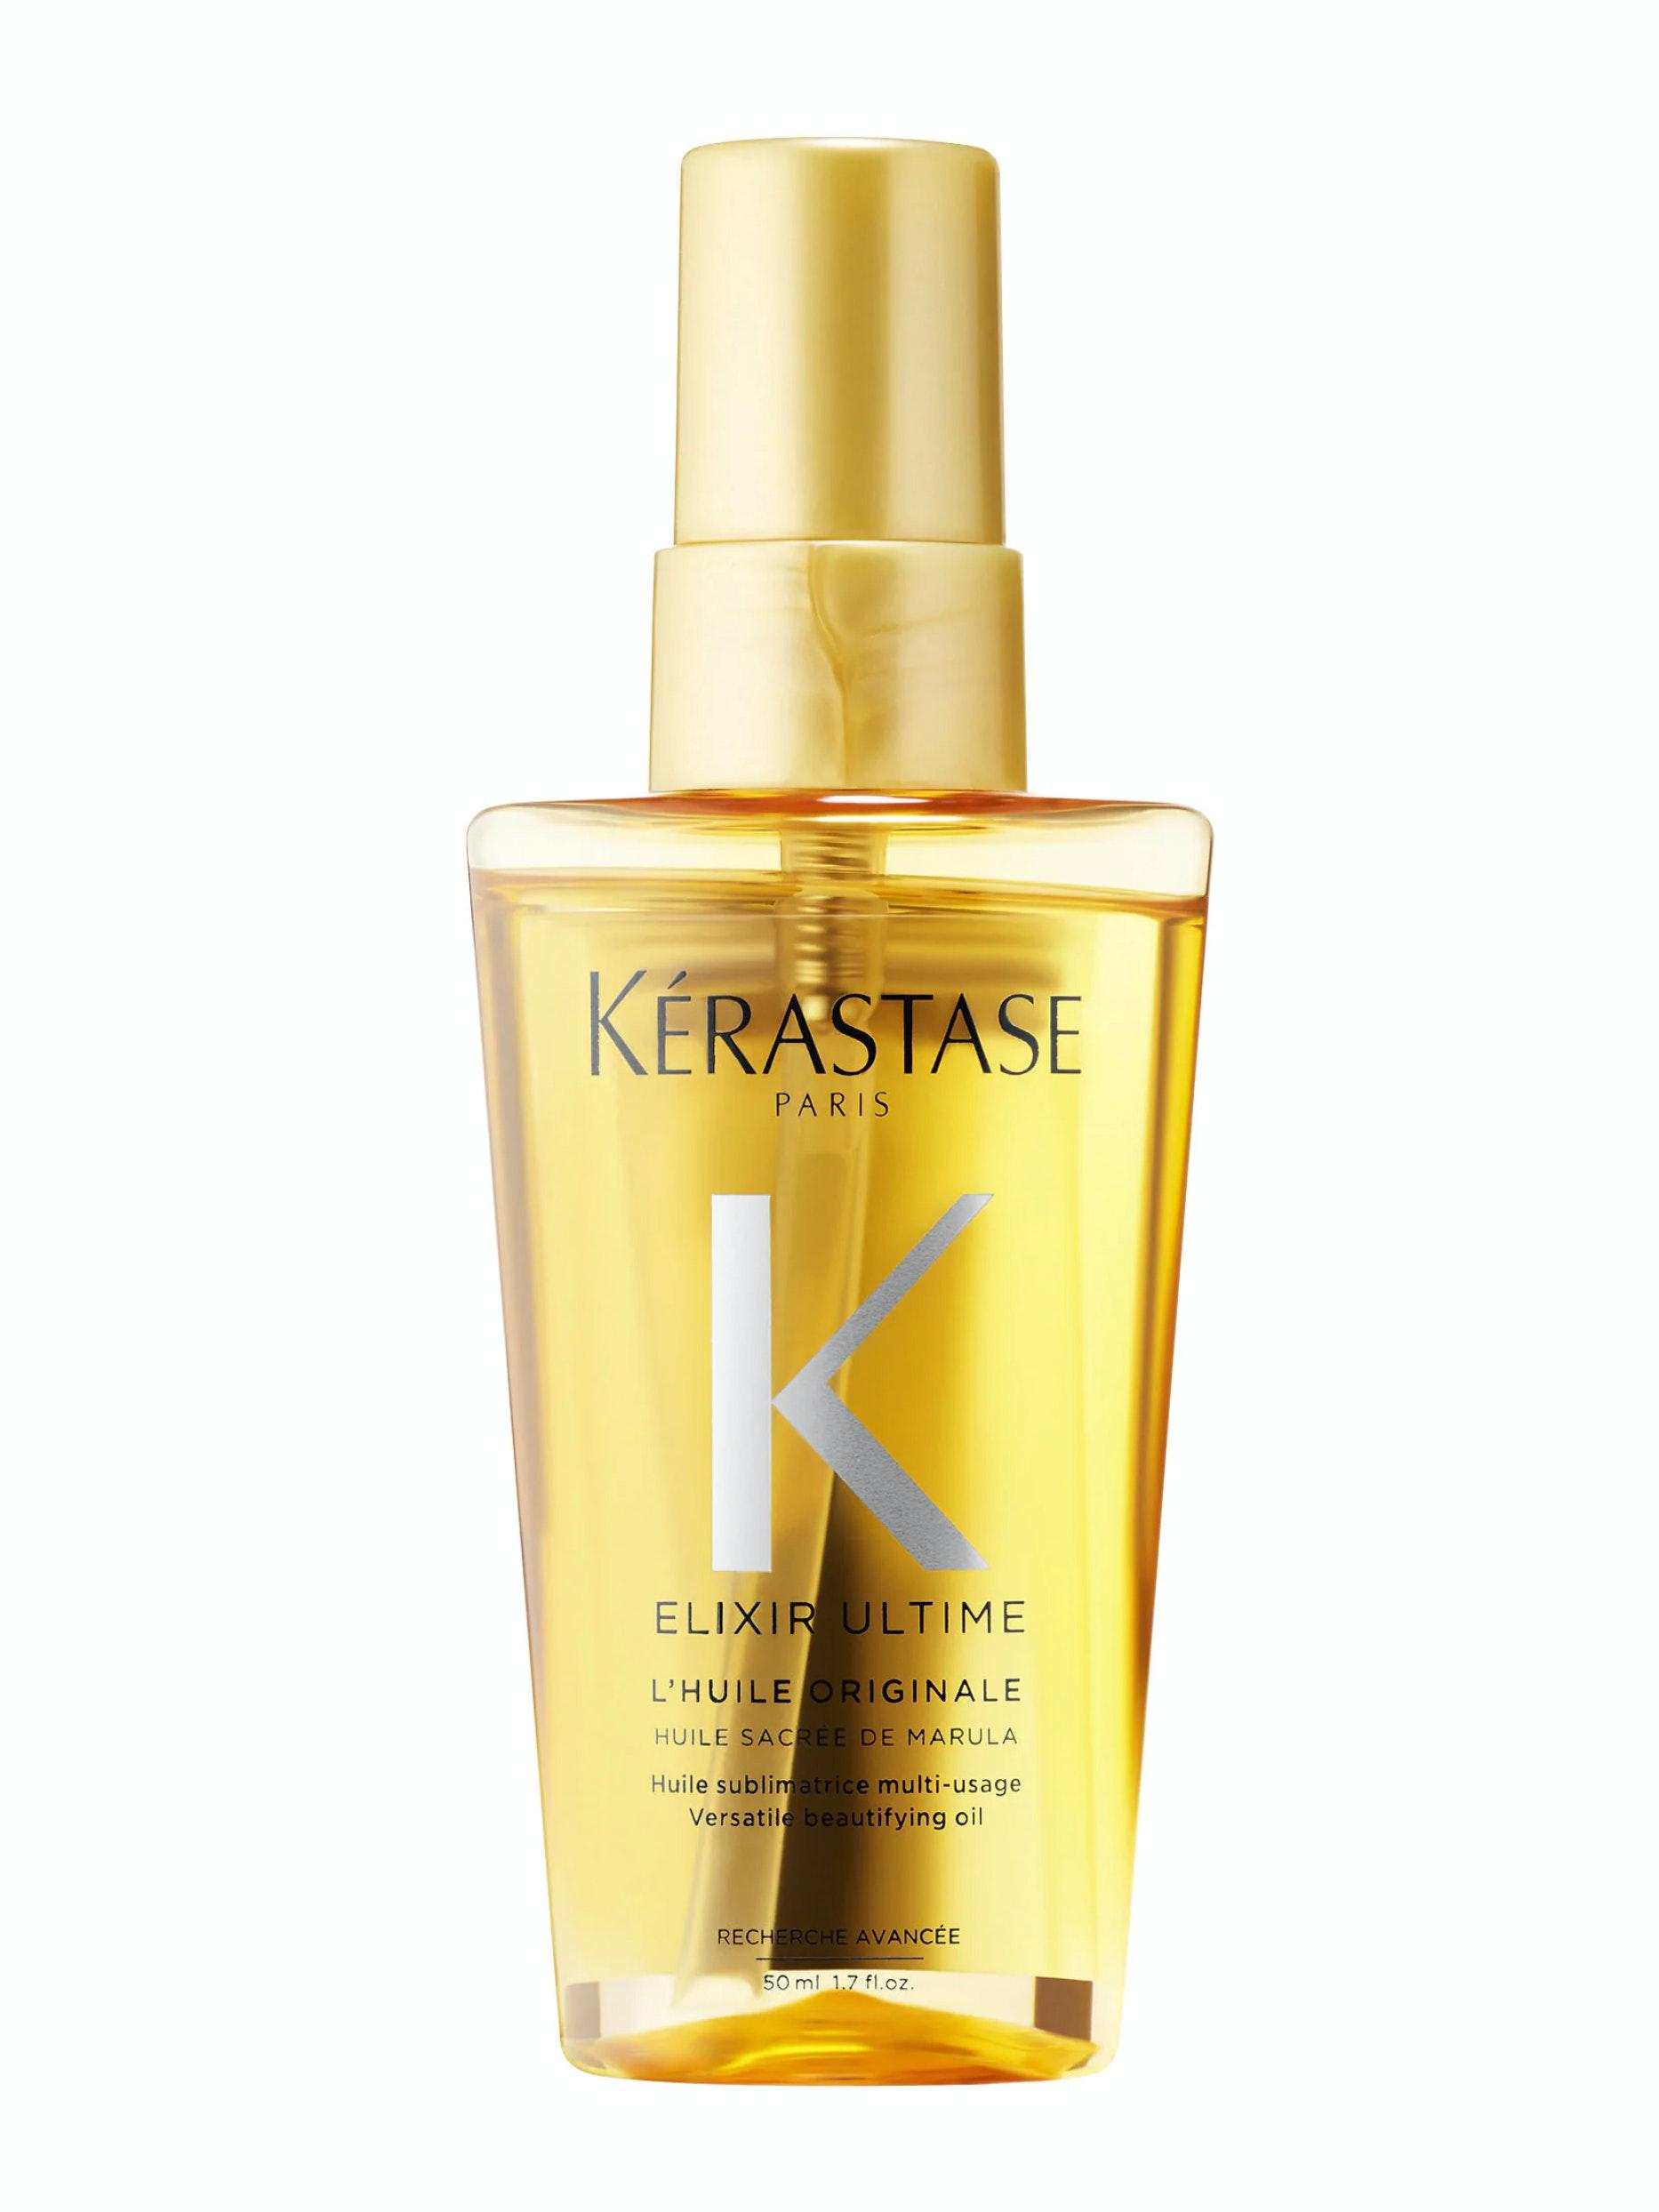 Kerastase Elixir Ultime L'Huile Originale Travel-Size Hair Oil